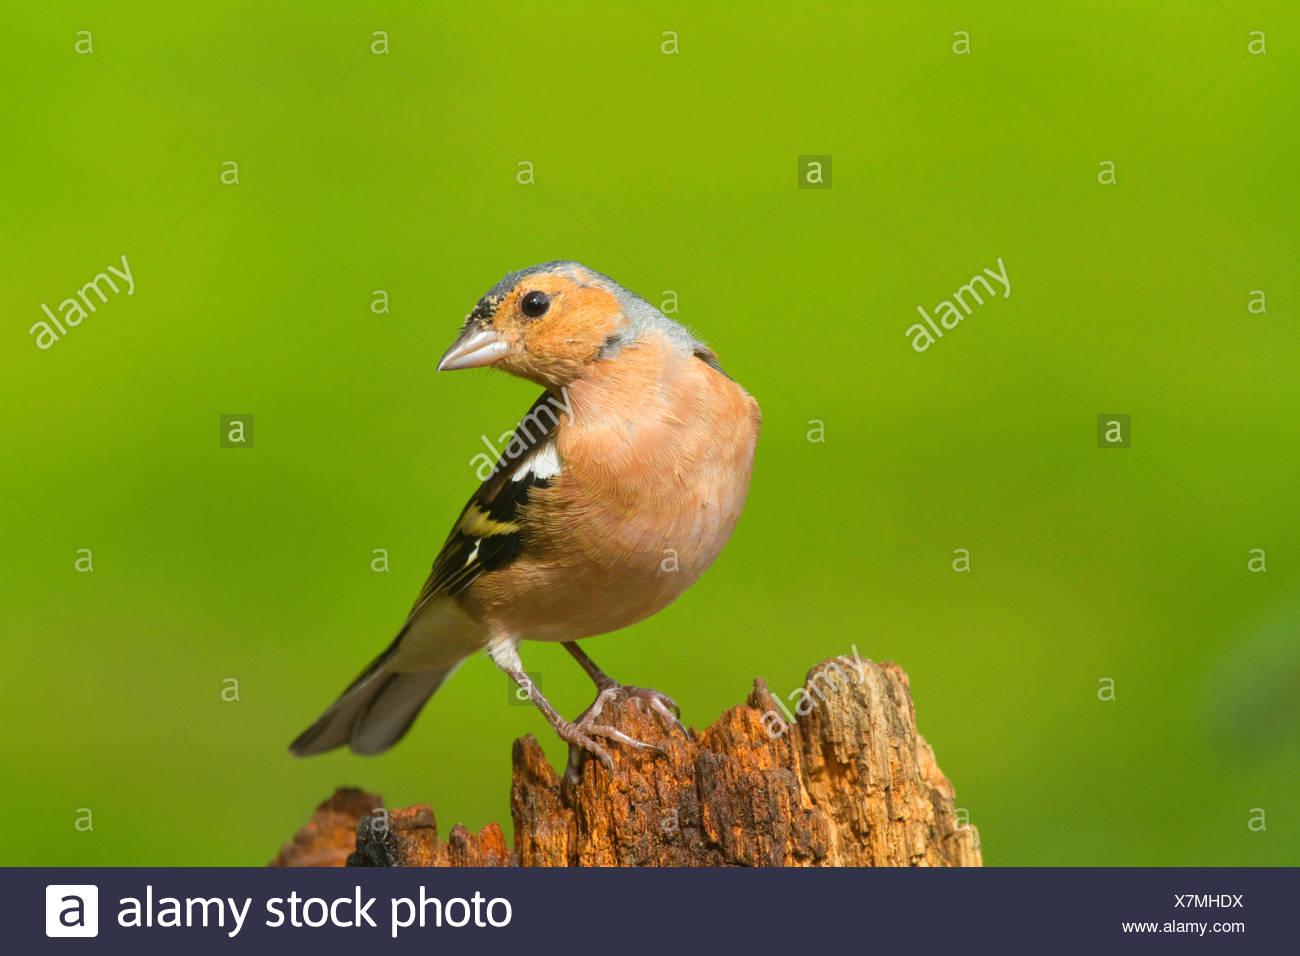 chaffinch (Fringilla coelebs), male on a tree snag, Germany, North Rhine-Westphalia - Stock Image